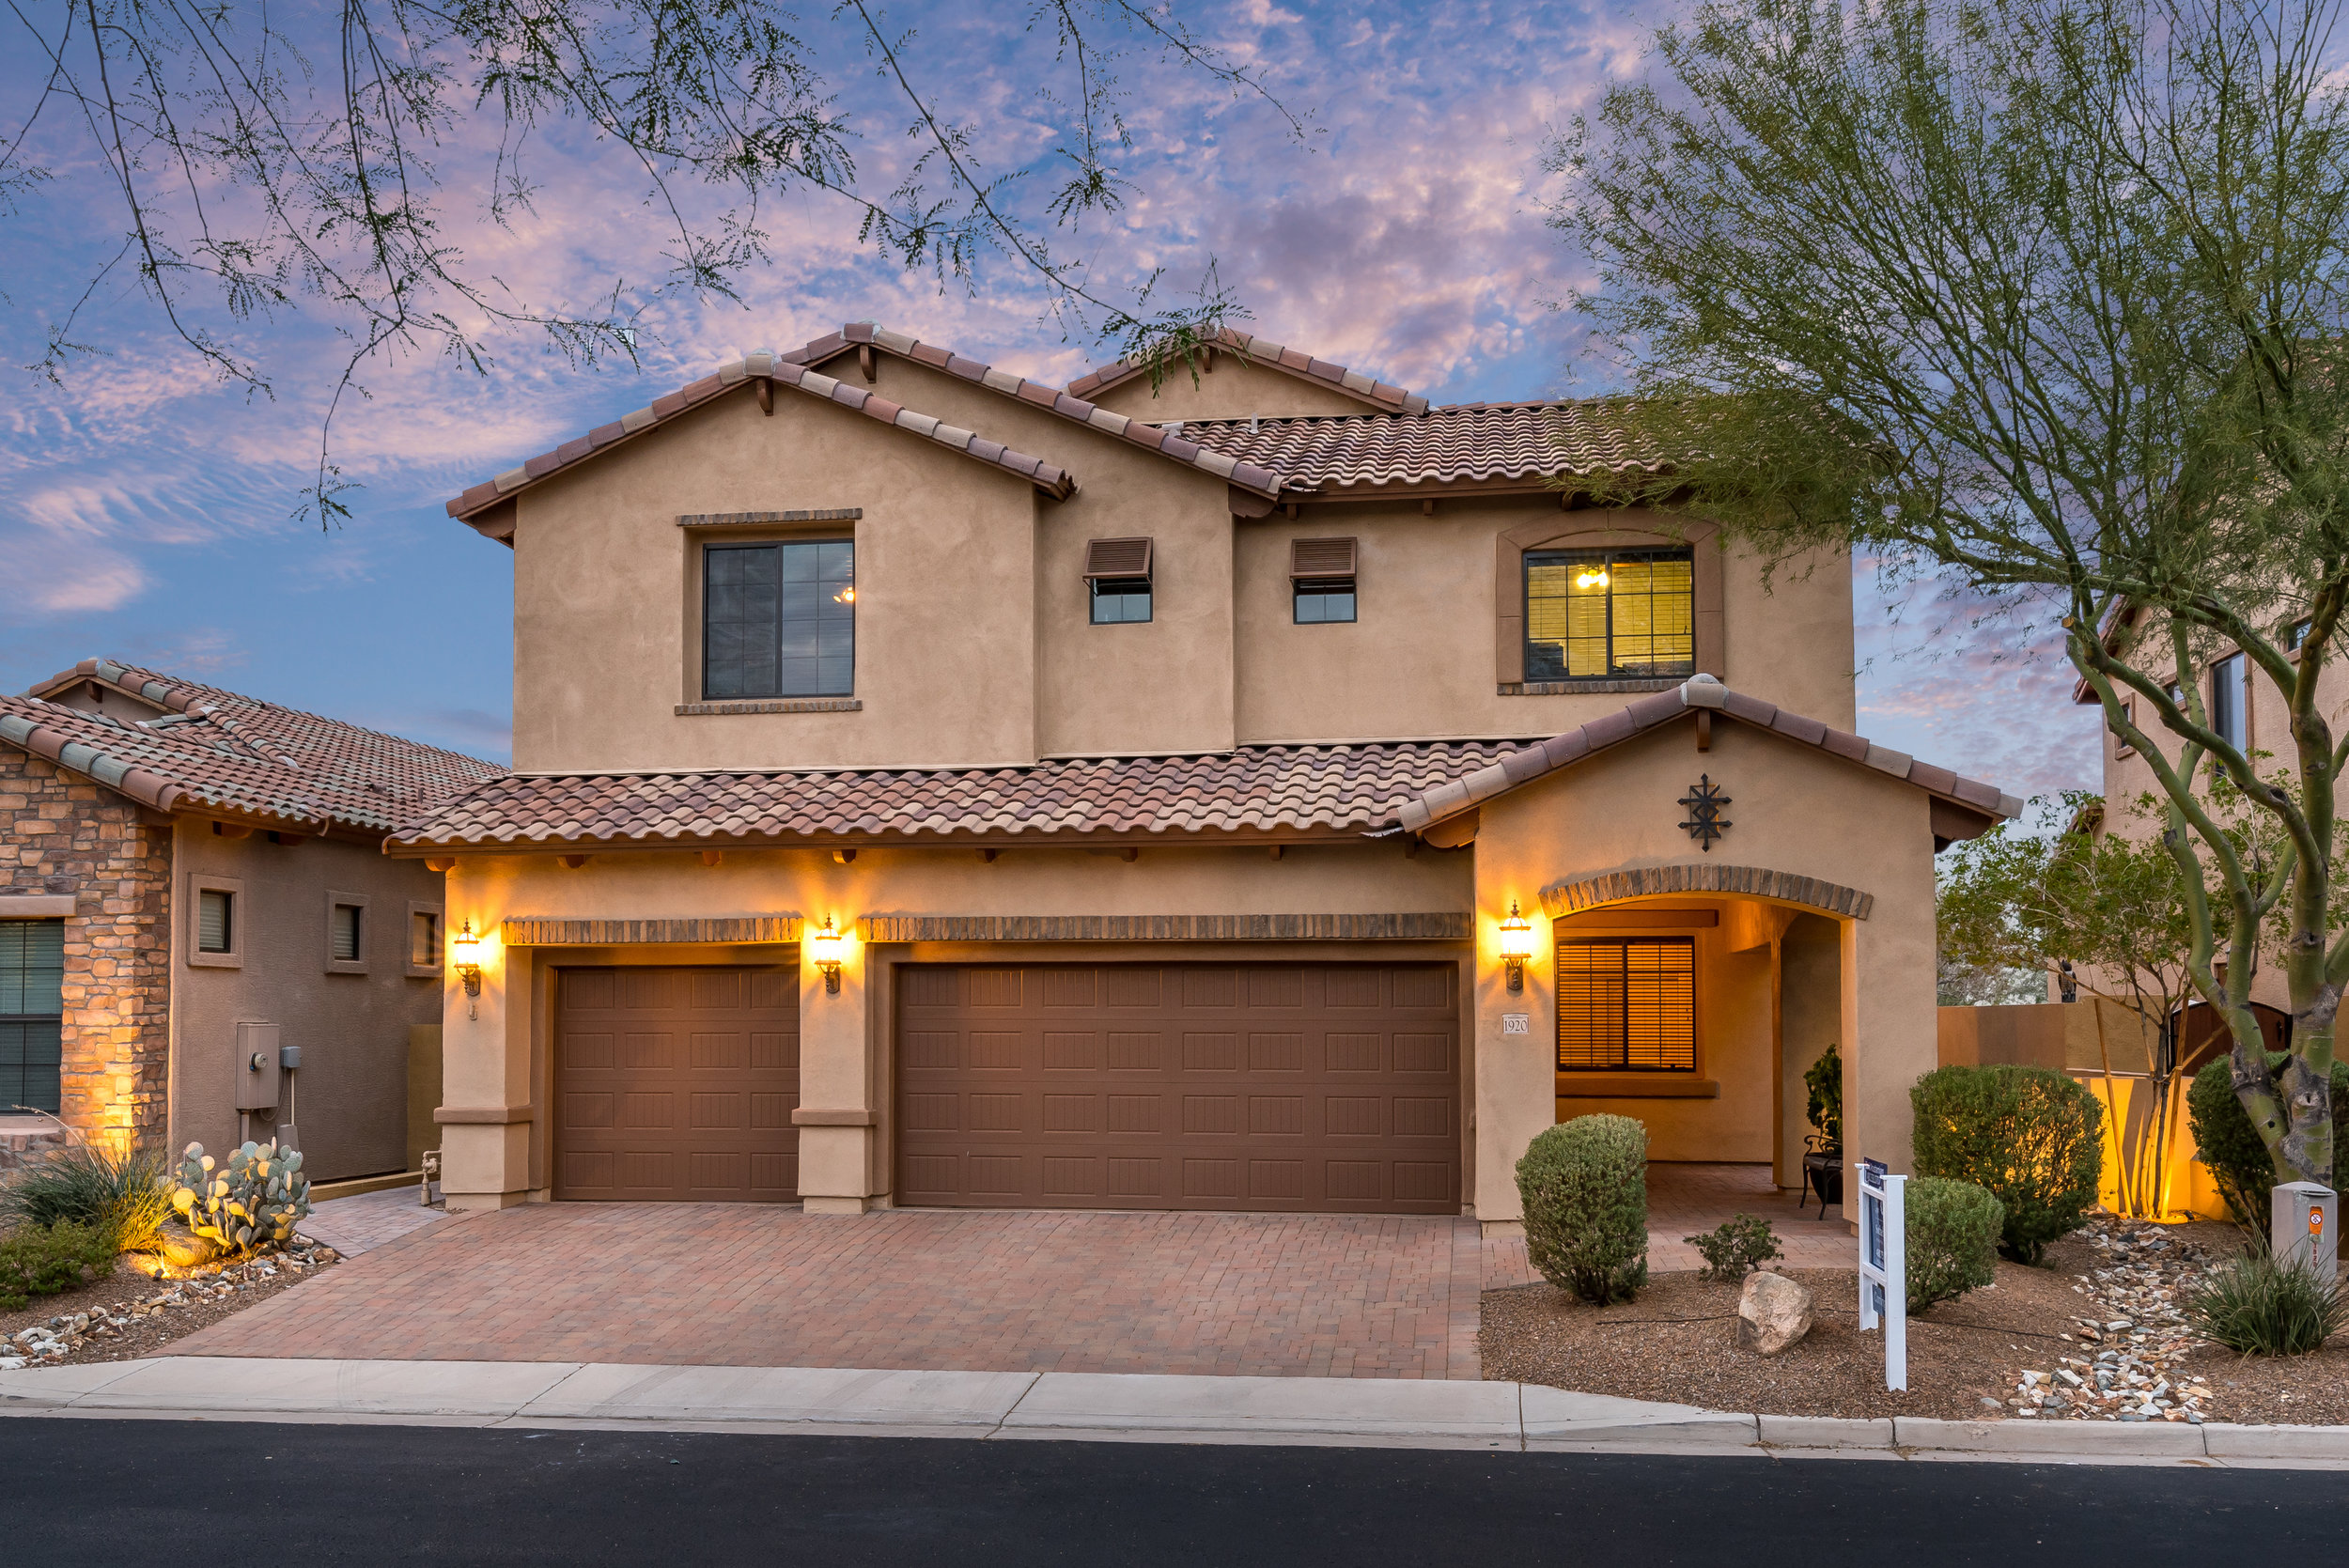 1920 N Channing, Mesa, AZ 85207 | $557,500